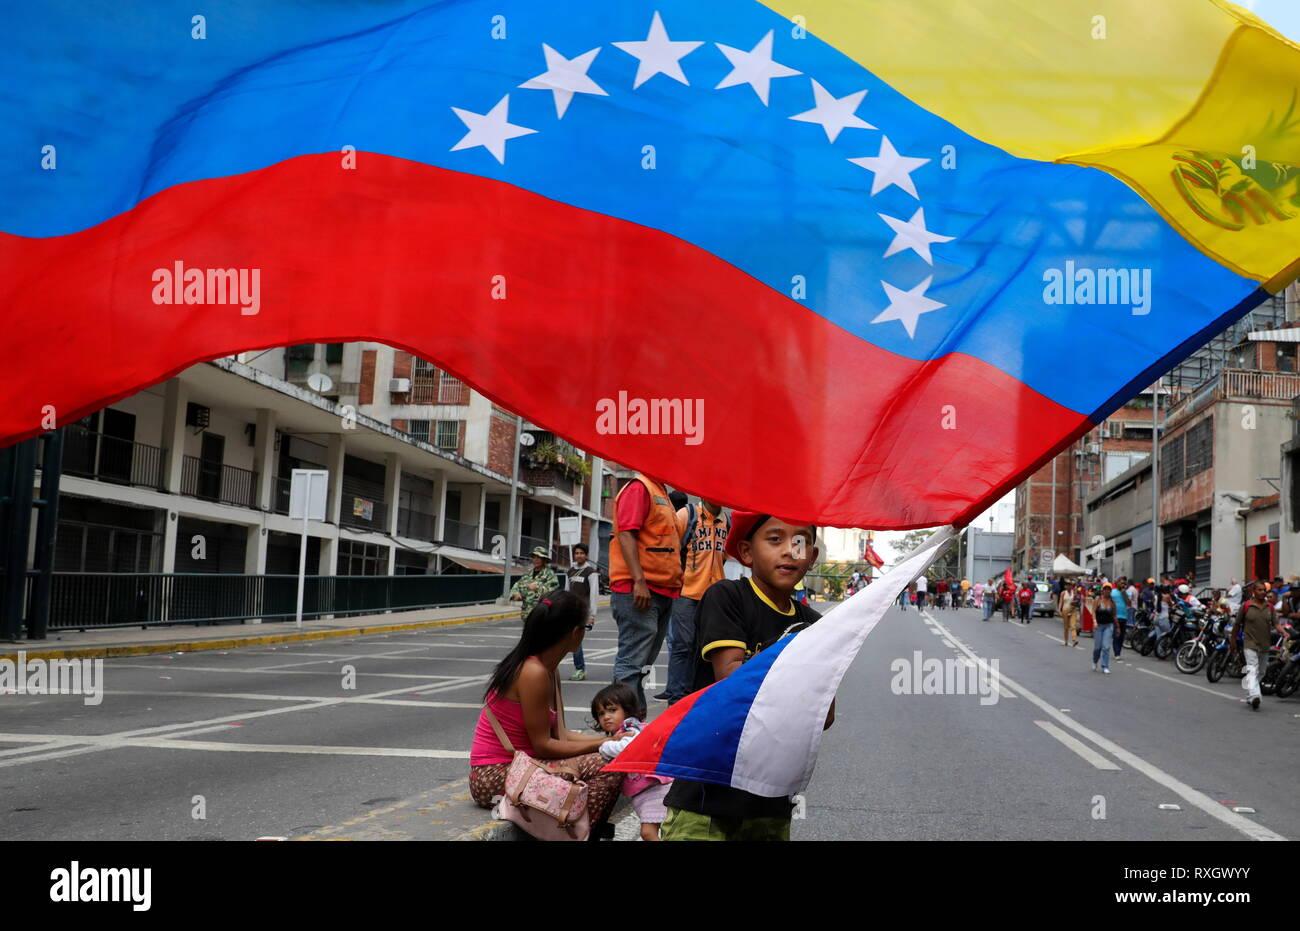 Caracas, Venezuela. 09th Mar, 2019. CARACAS, VENEZUELA - MARCH 10, 2019: Supporters of Venezuela's President Nicolas Maduro during a rally marking Anti-imperialism Day by the Miraflores Palaca. Valery Sharifulin/TASS Credit: ITAR-TASS News Agency/Alamy Live News - Stock Image